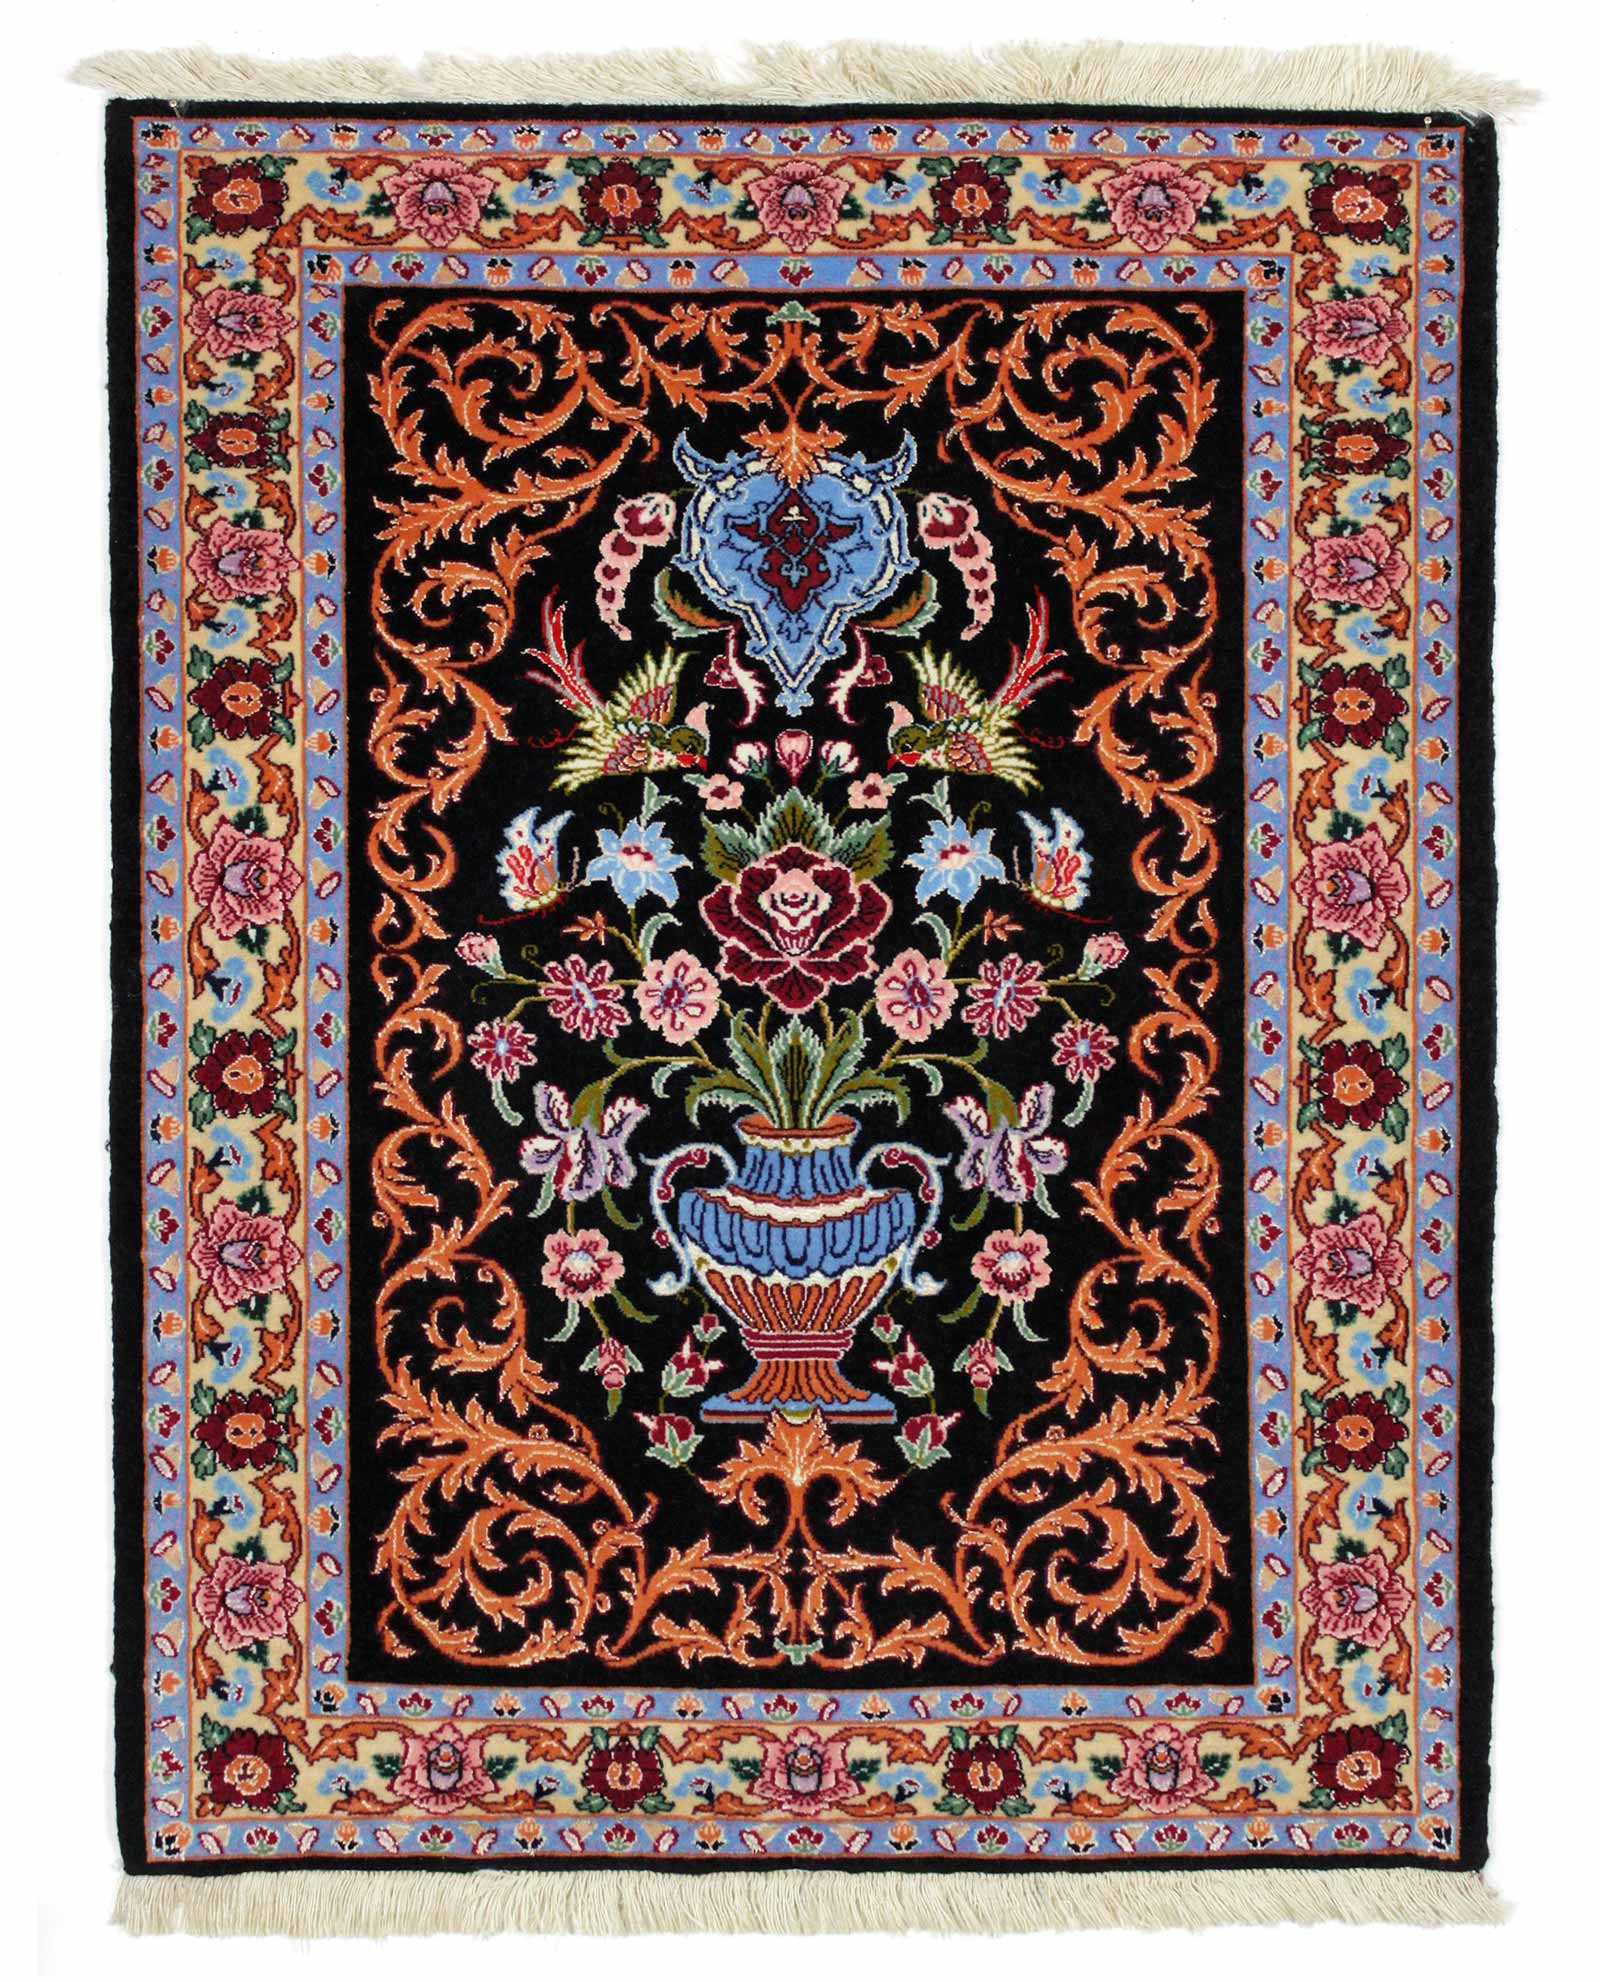 Modern Persian Tabriz Design Rug 44687 Nazmiyal Antique Rugs: Persian Carpet Iranian Amazing Unique Shaped Home Design